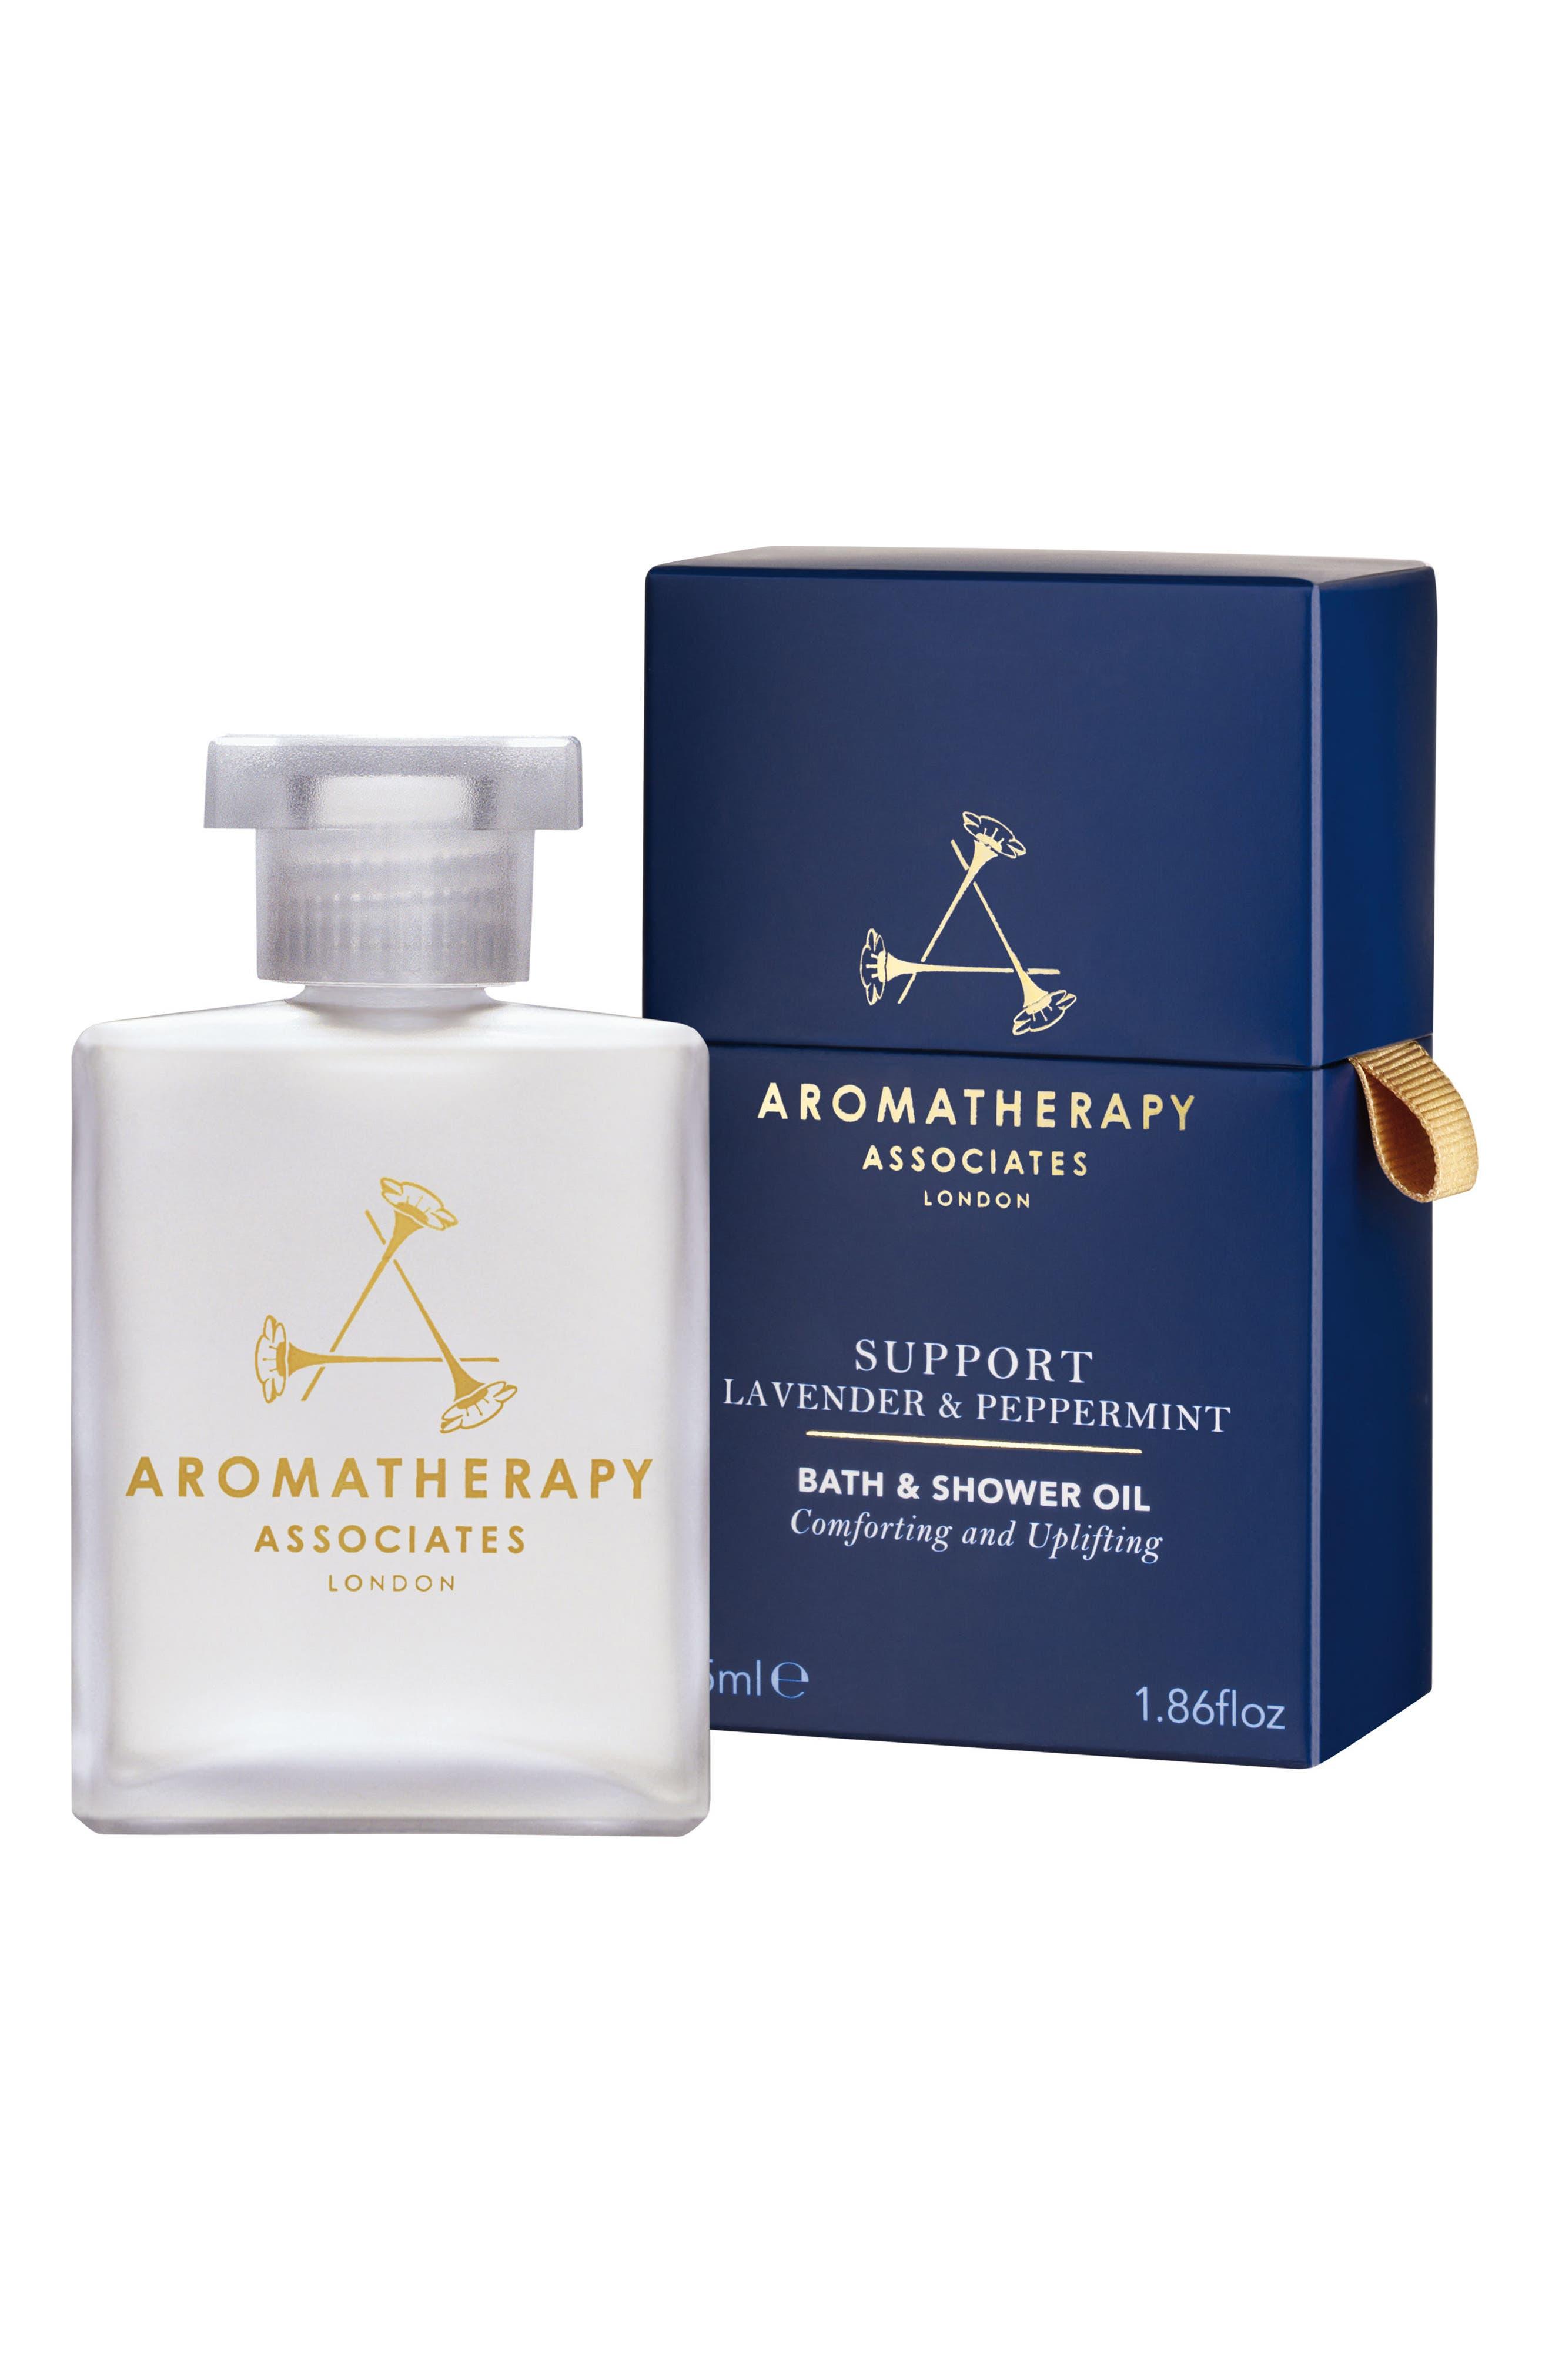 Support Lavender & Peppermint Bath & Shower Oil,                         Main,                         color, Support Lavender Peppermint